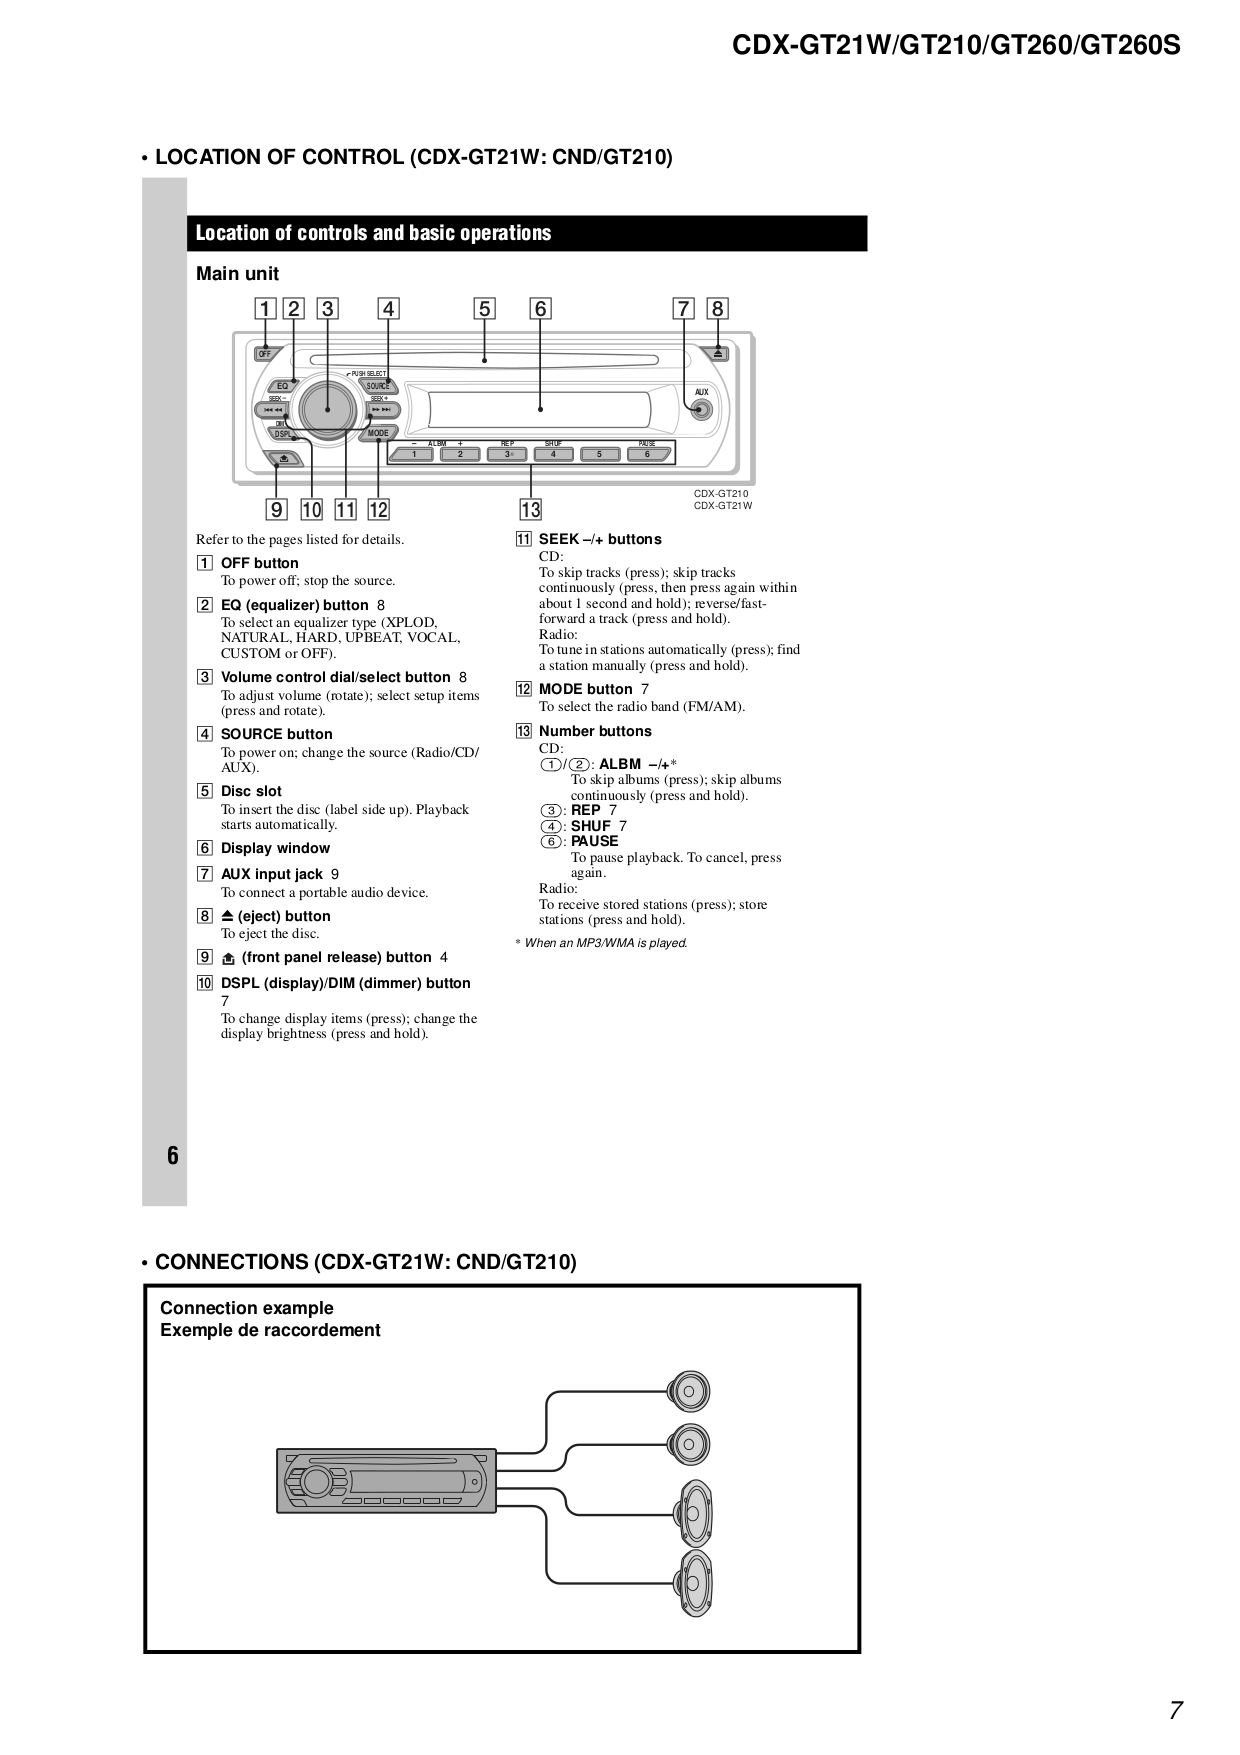 Sony Stereo Receiver Wiring Diagram Library Eq To Reciever Pdf Manual For Car Cdx Gt21w Rh Umlib Com